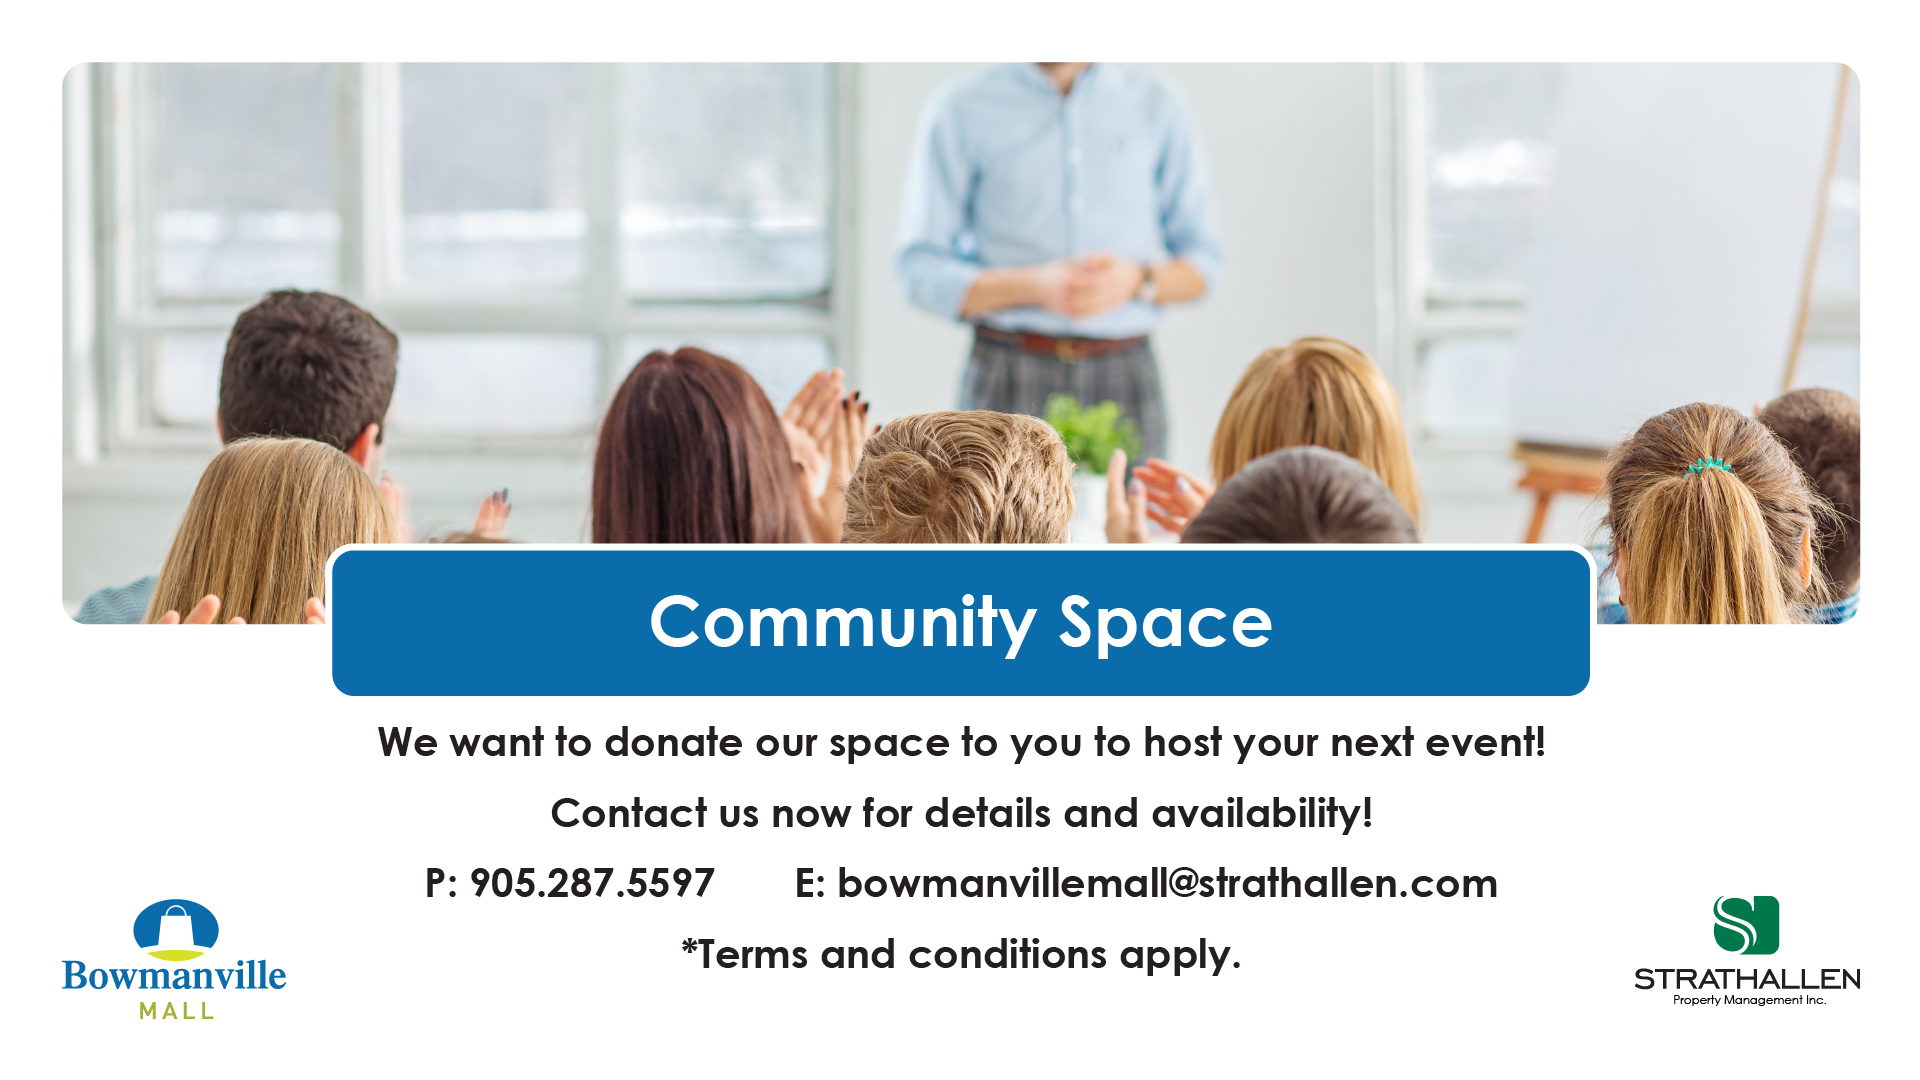 Community Space - Banners_Bowmanville copy 2